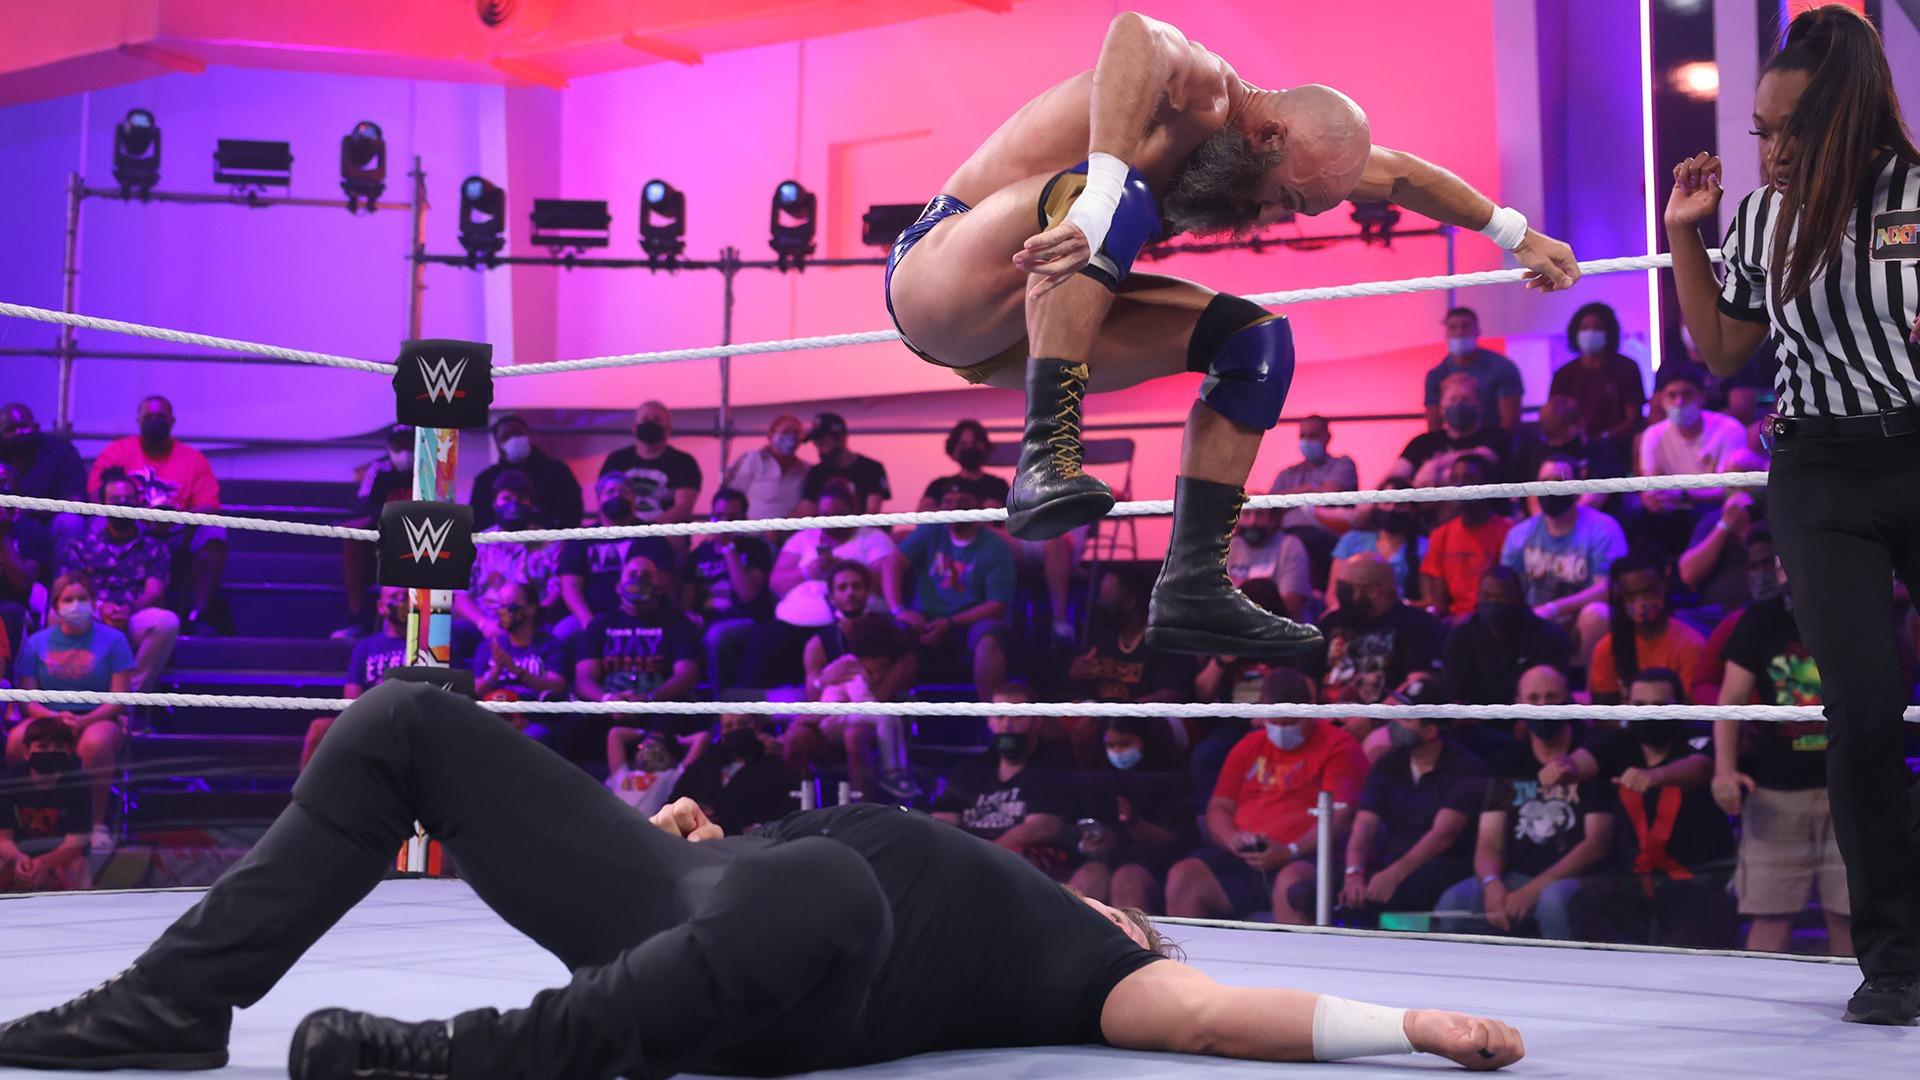 Mas o NXT nem foi ruim